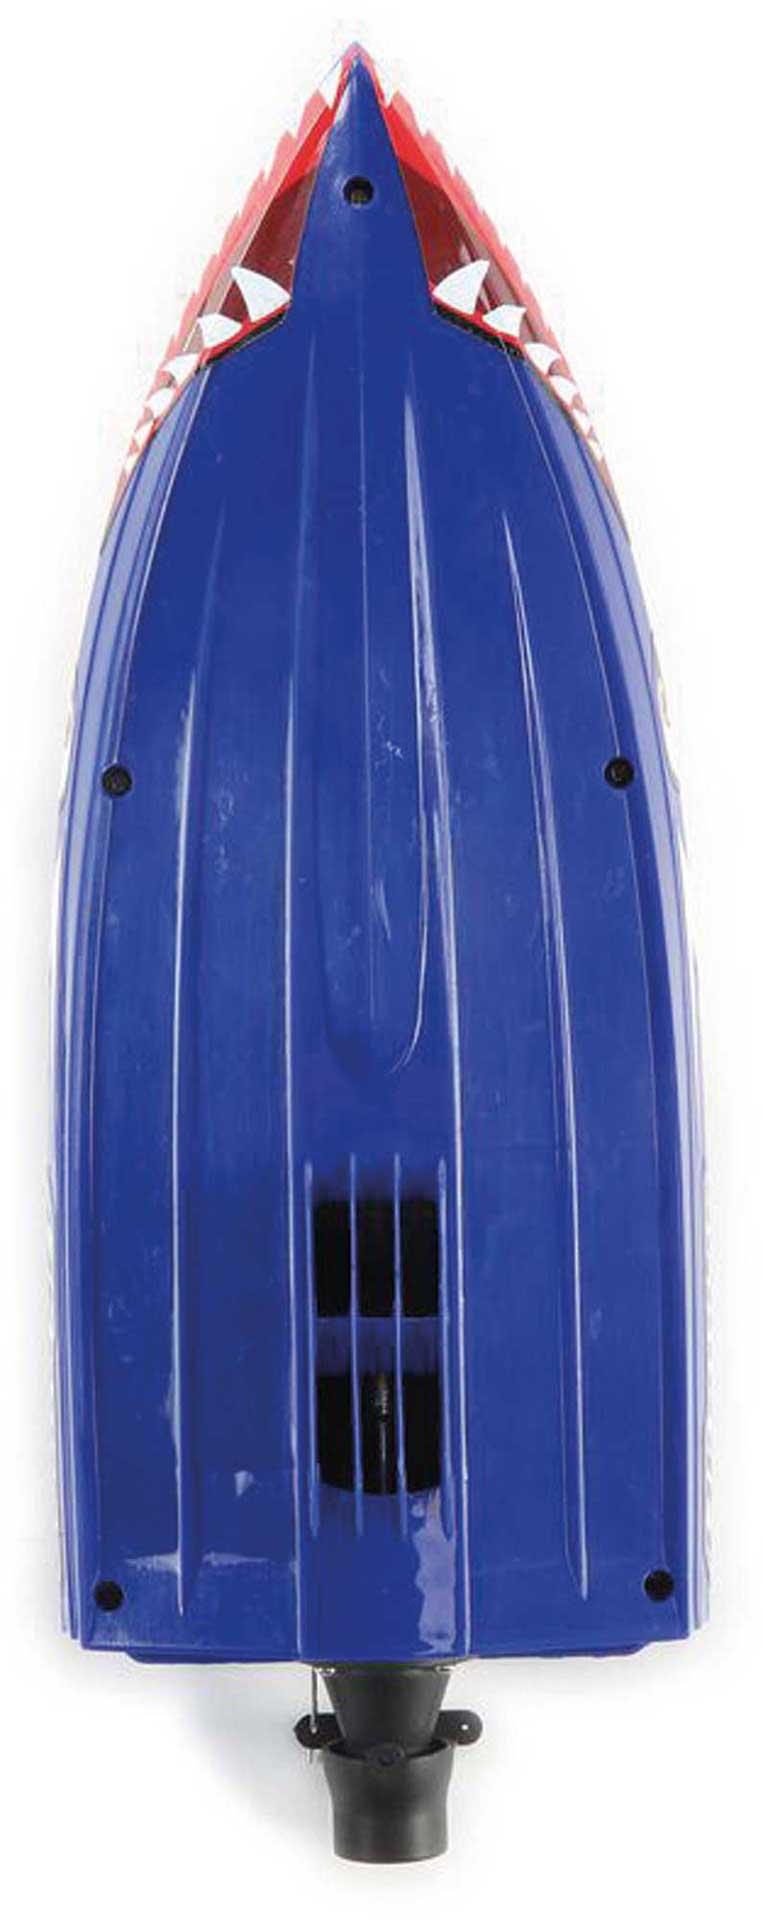 PROBOAT SPRINT JET 9-INCH BOAT RTR BLUE